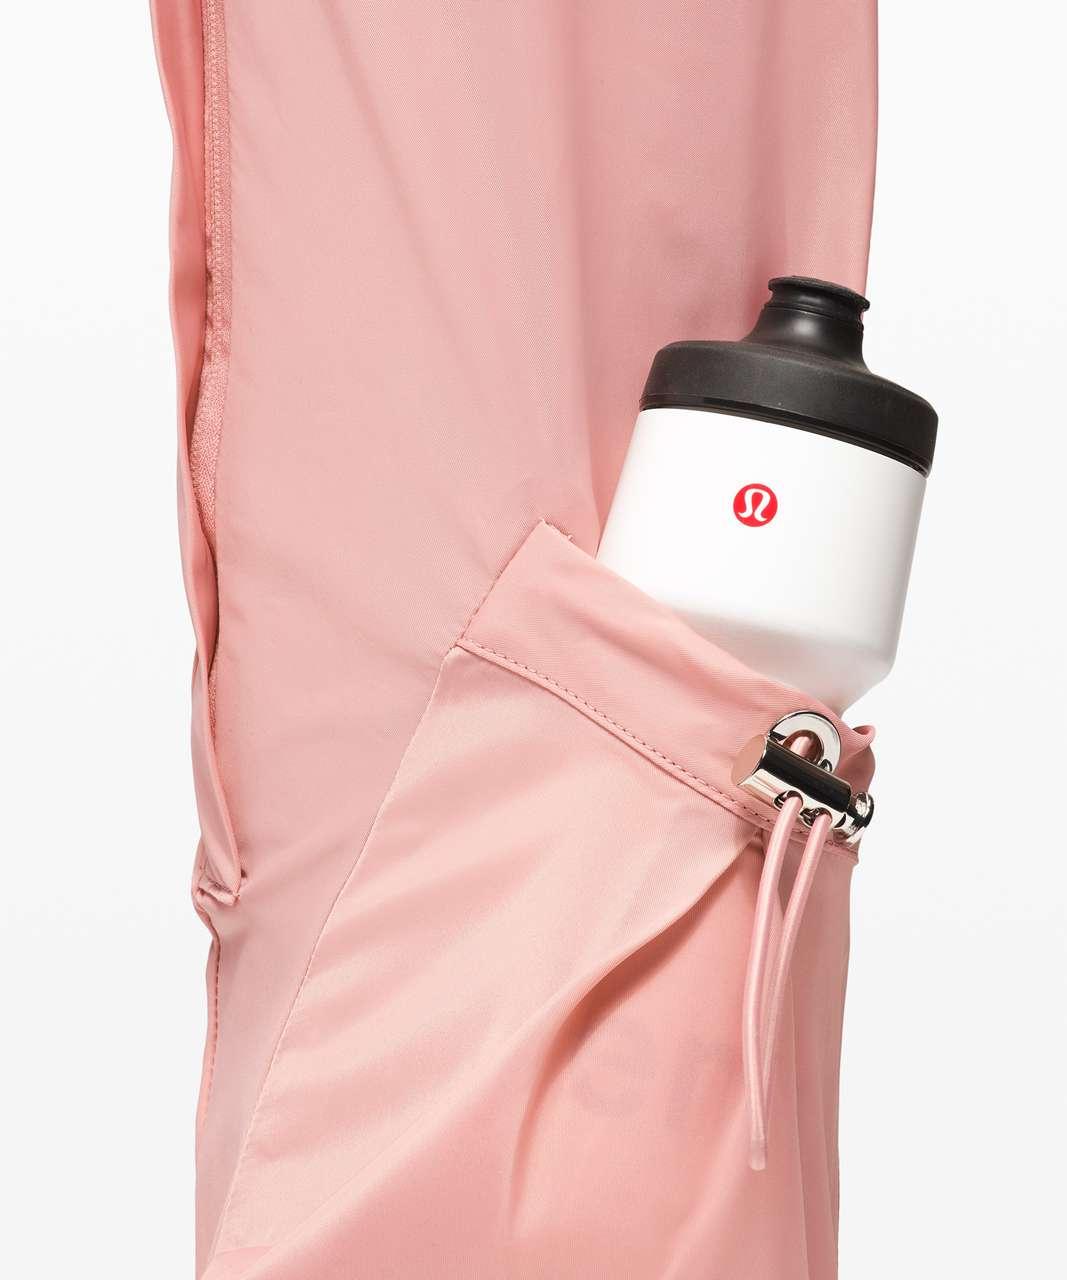 Lululemon The Yoga Mat Bag *16L - Pink Puff